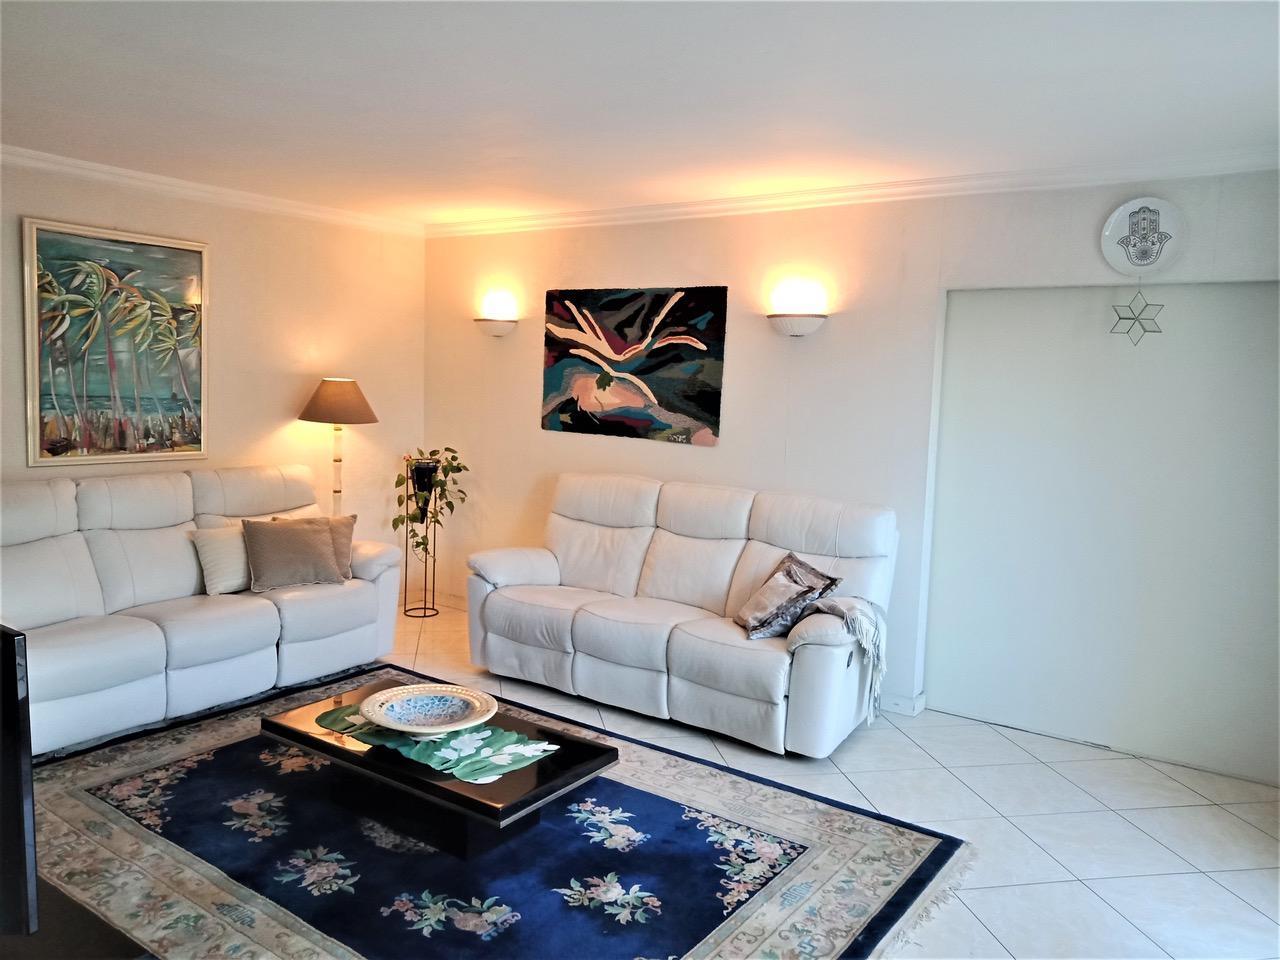 Villiers-le-Bel, 4 Bedrooms Bedrooms, ,2 BathroomsBathrooms,Appartement,A Vendre,1059